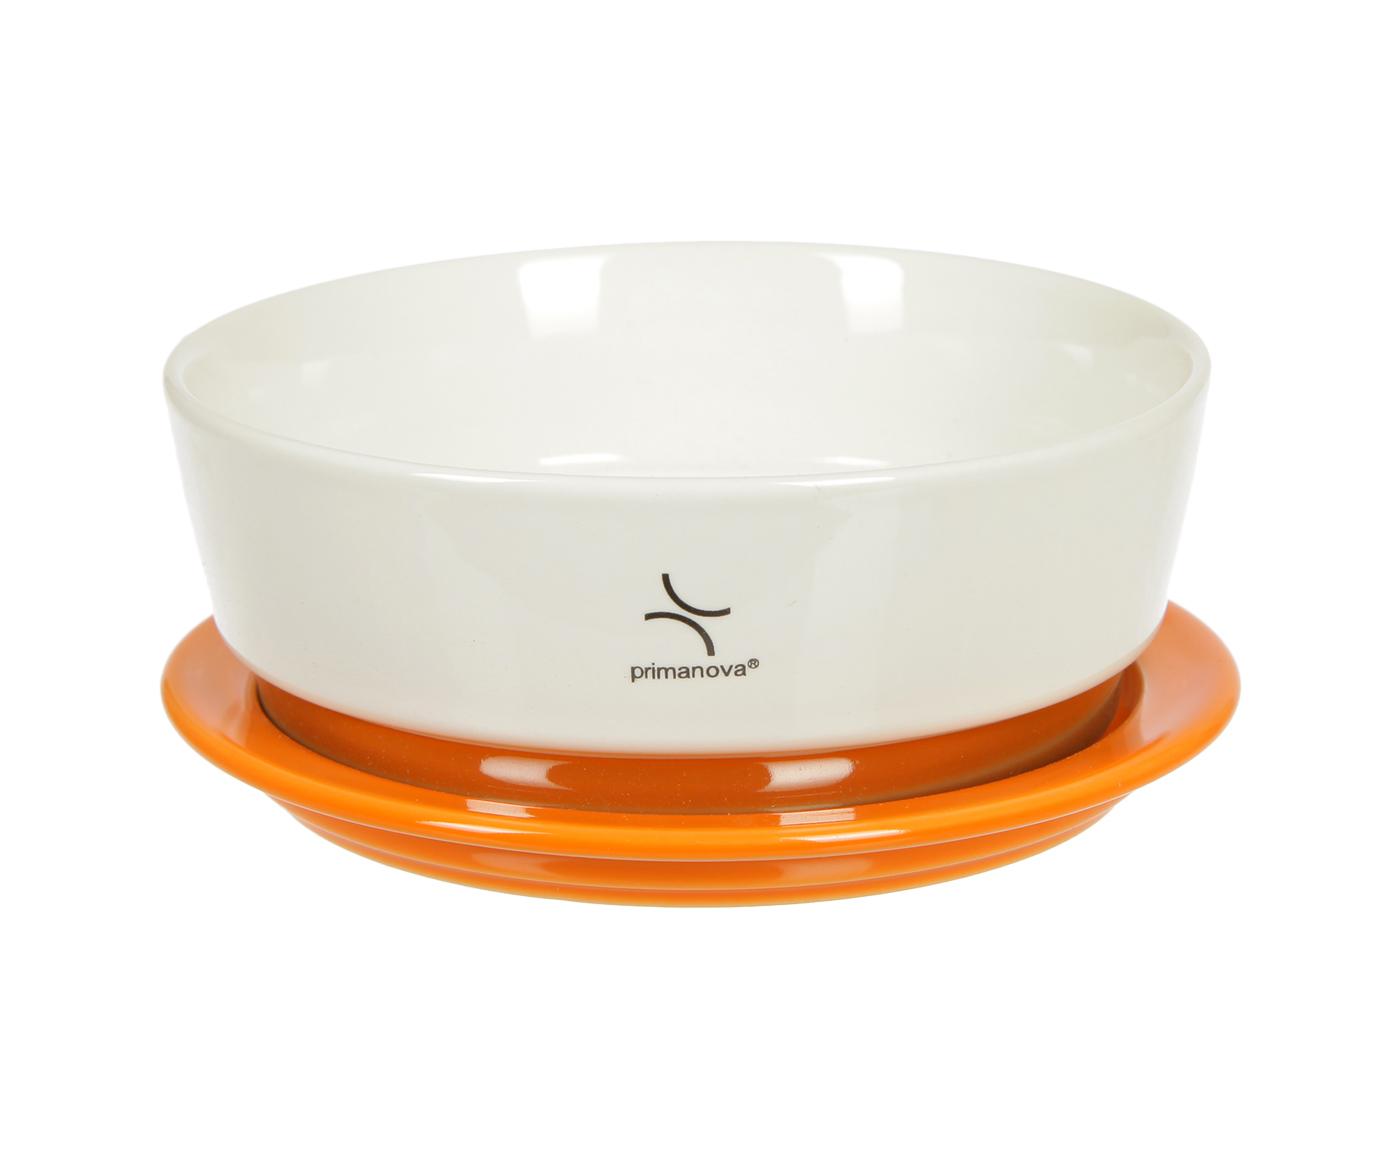 ATRIA Тарелка для завтрака, керамика 2742559 - Babyblog.ruVkontakteOdnoklassnikiFacebookPinterestTwitterEmailPrintVkontakteOdnoklassnikiFacebookWhatsAppViber